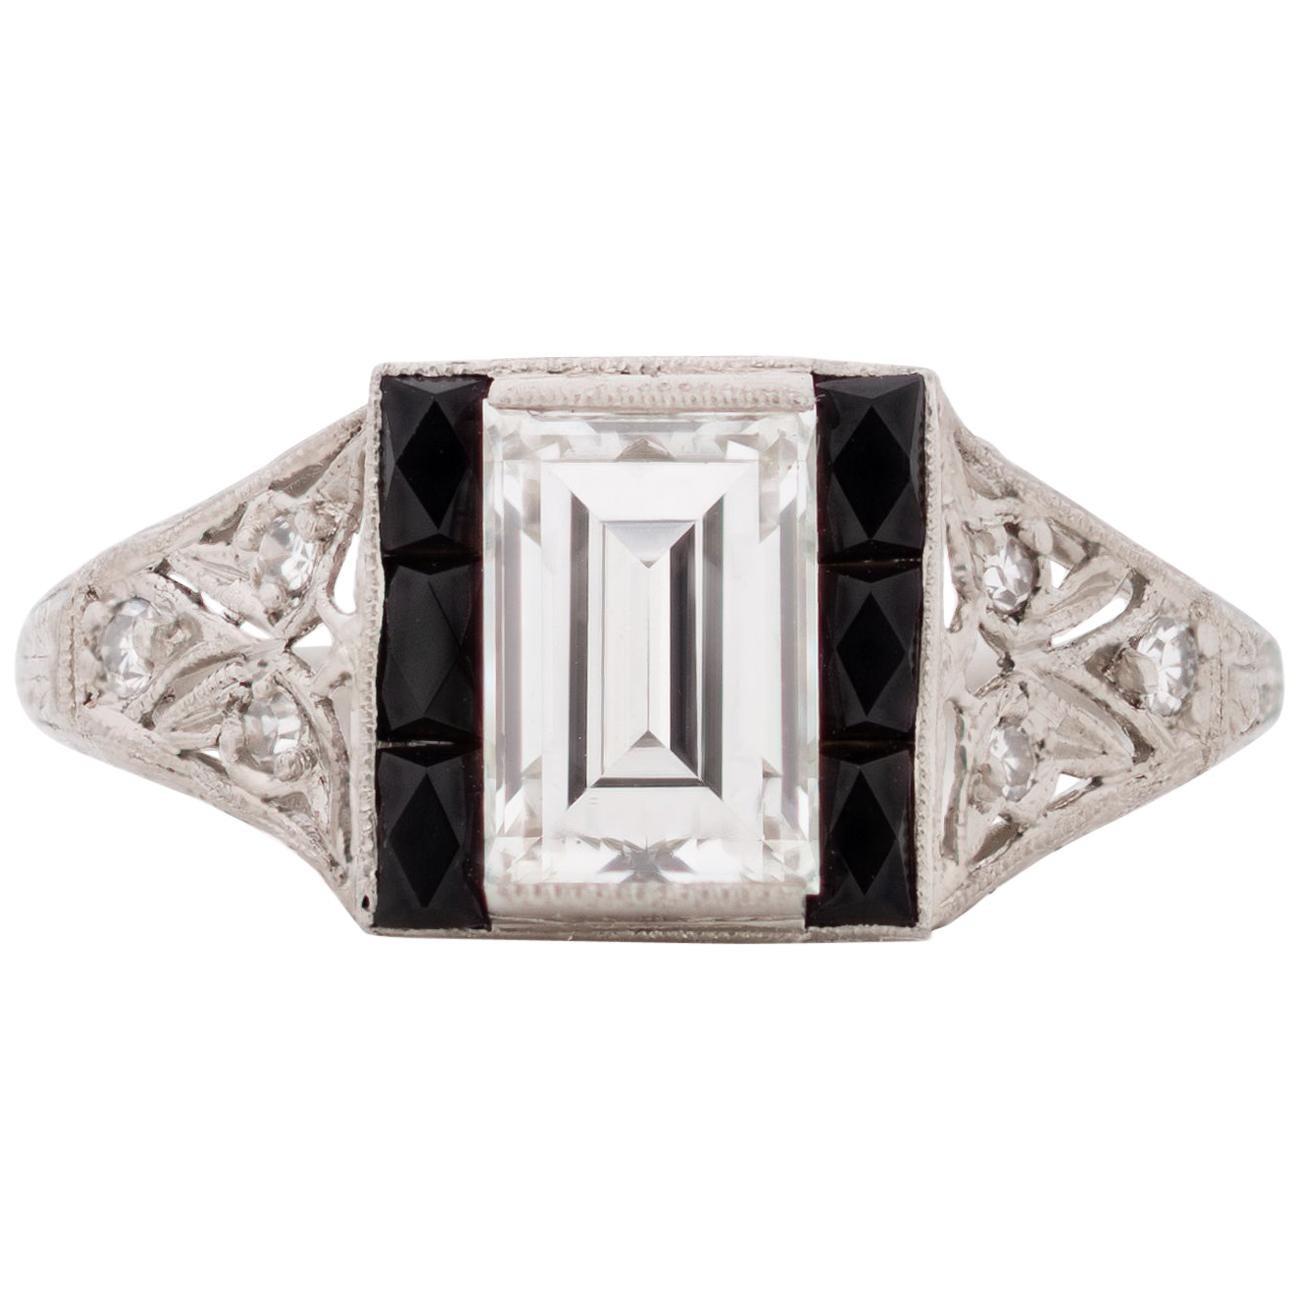 GIA Certified 1.09 Carat Art Deco Diamond Platinum Engagement Ring